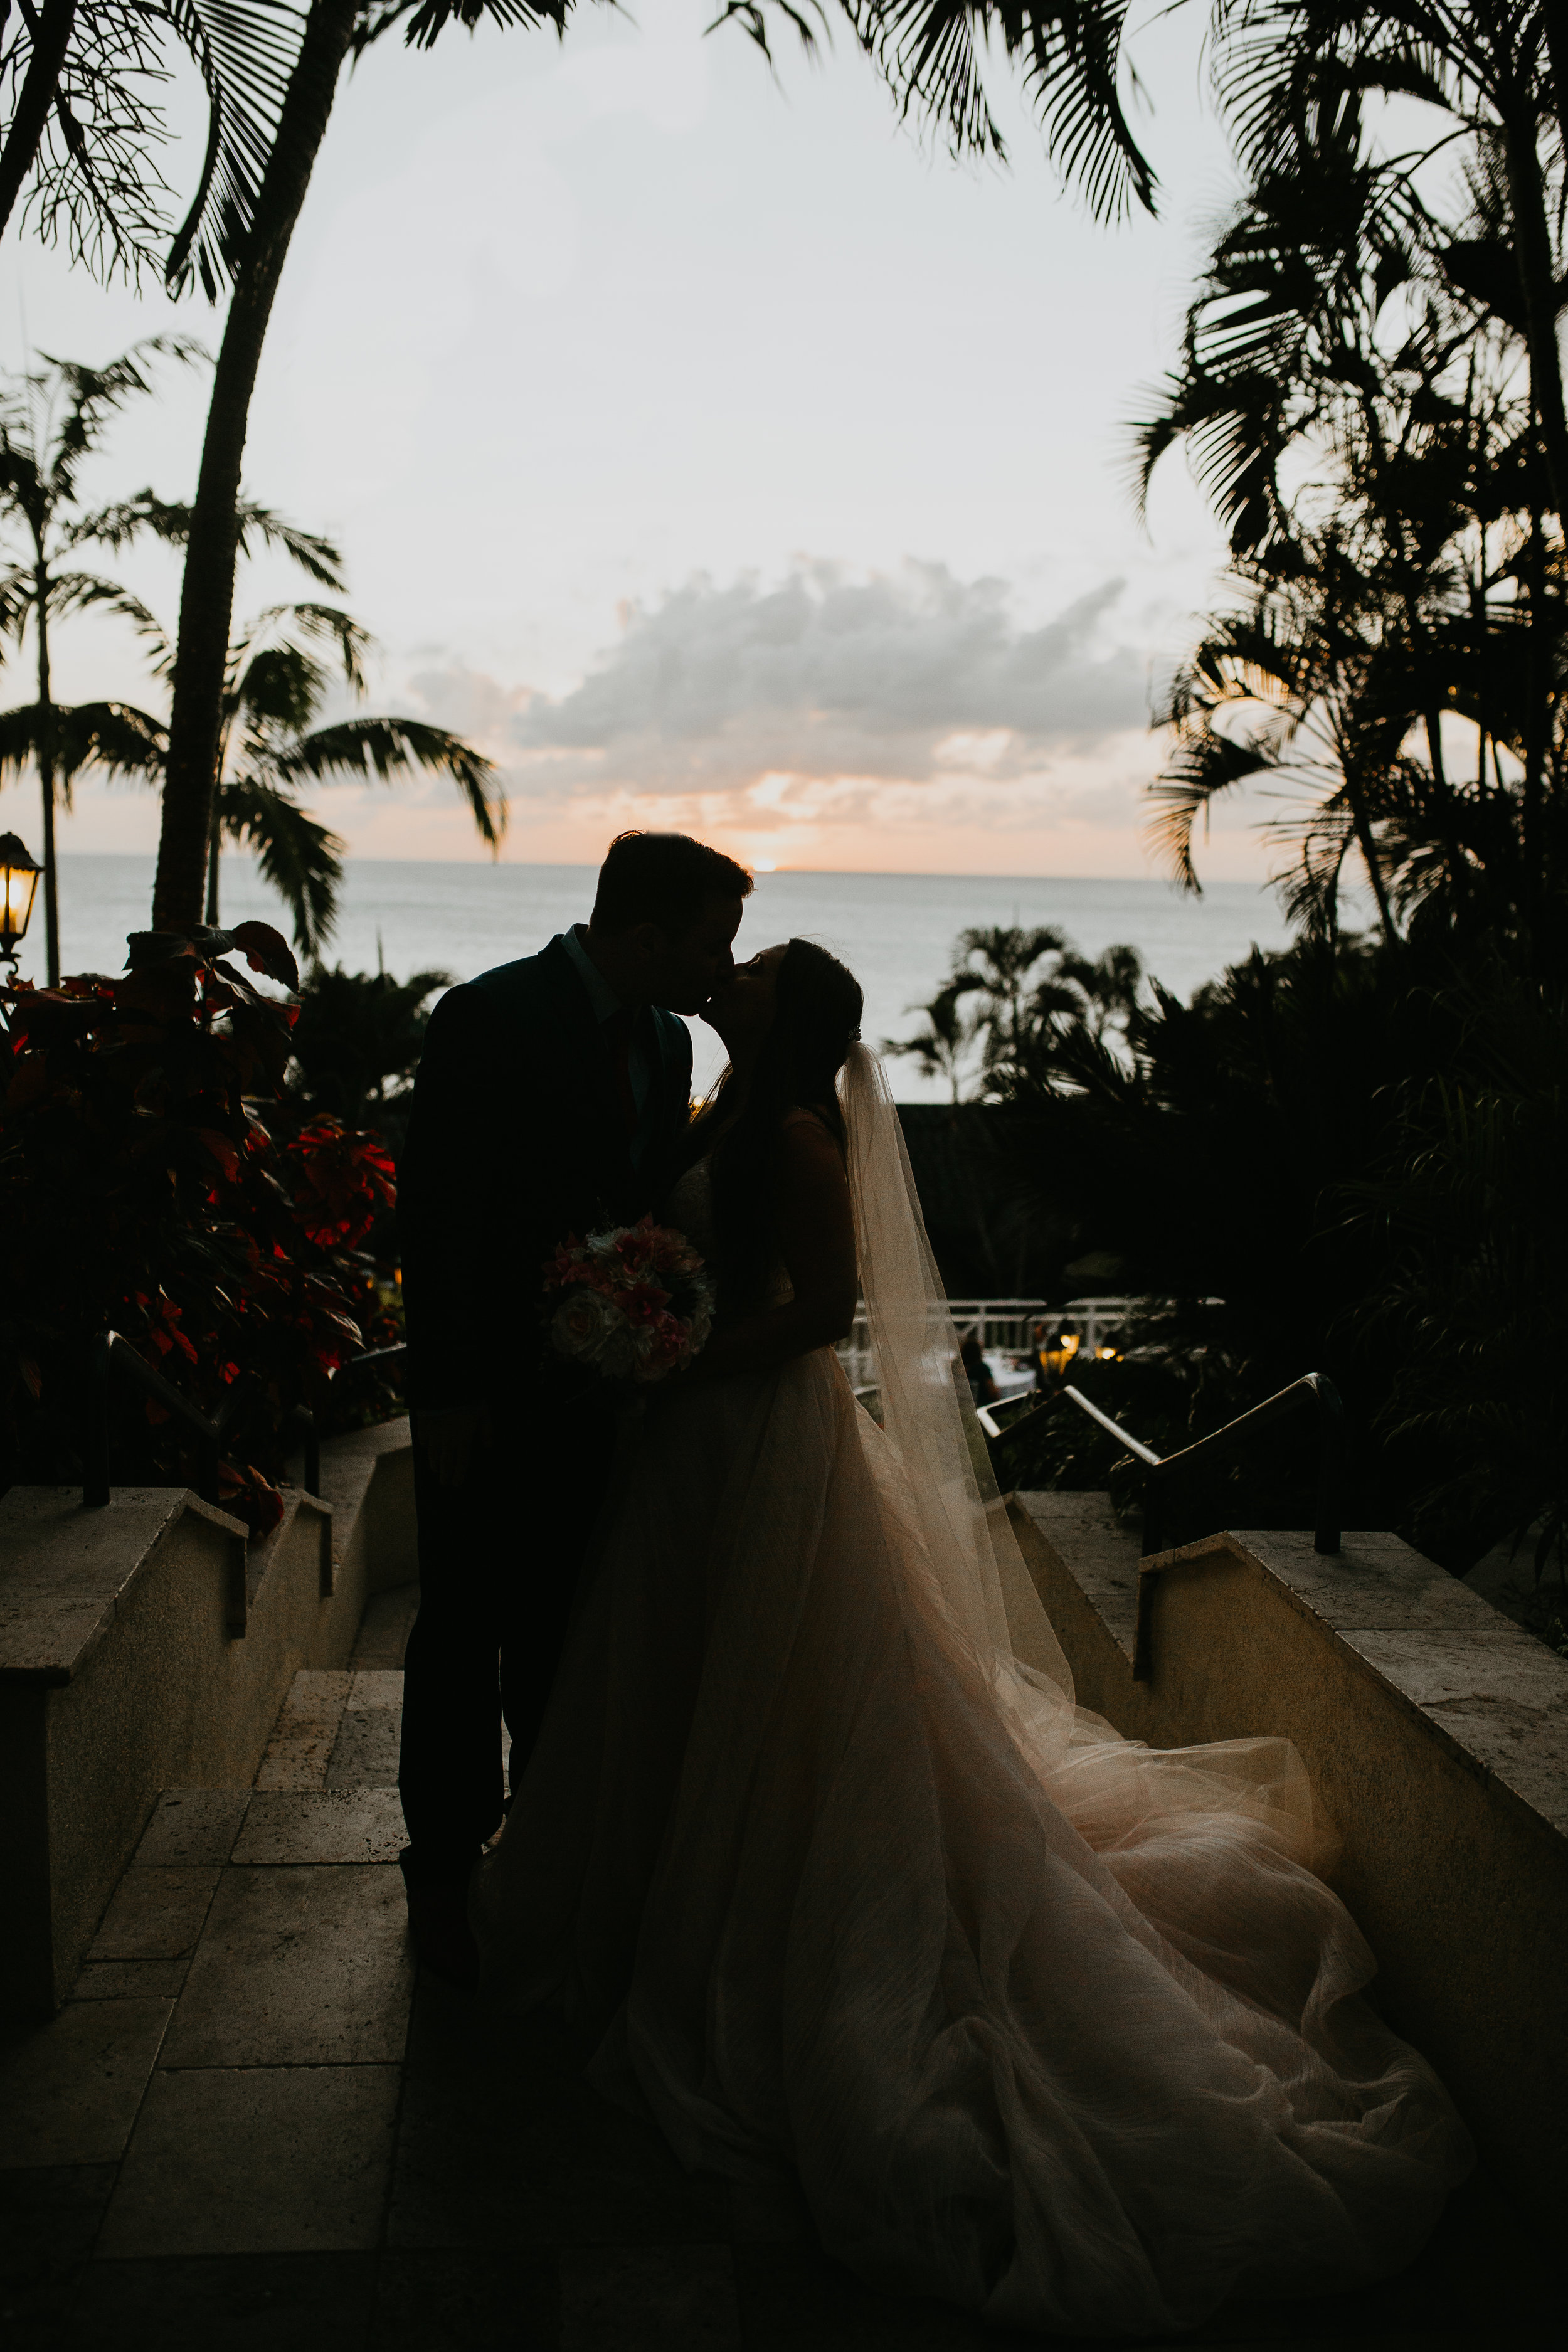 nicole-daacke-photography-destination-wedding-in-st-lucia-sandals-la-toc-intimate-island-wedding-carribean-elopement-photographer-chill-island-wedding-124.jpg